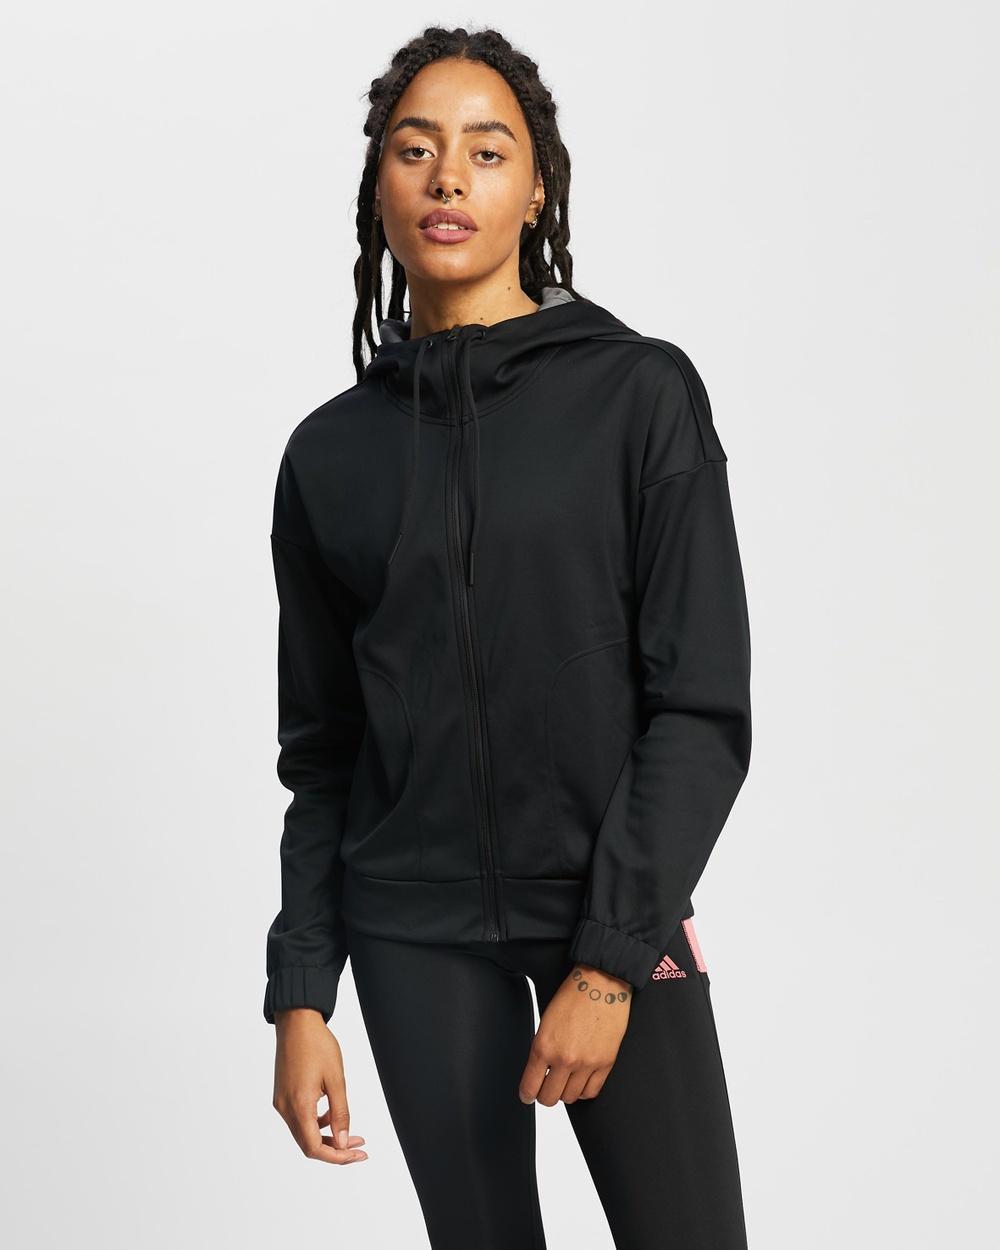 adidas Performance Sportswear Most Versatile Player Sweatshirt Coats & Jackets Black